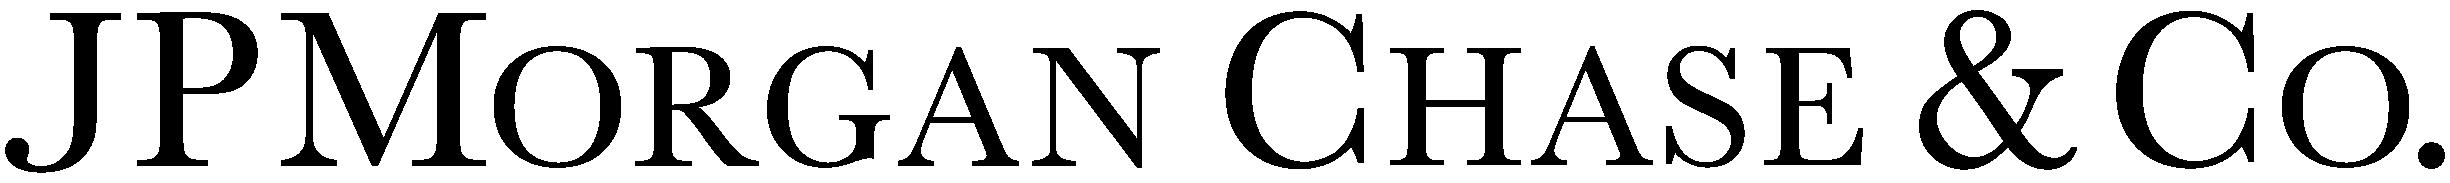 JPMC_logo_HIGHREZ